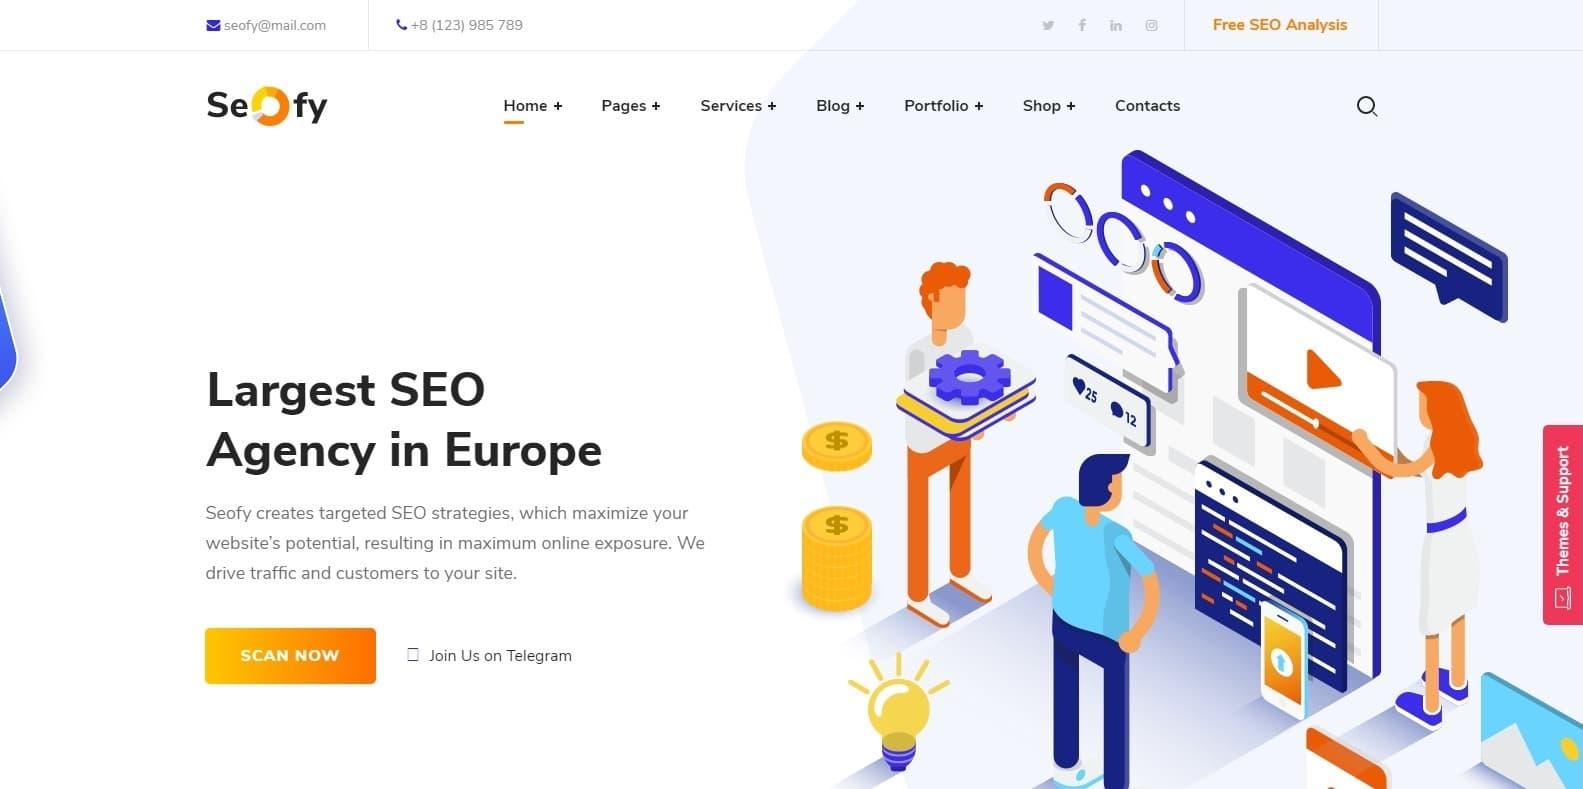 seofy-marketing-website-template